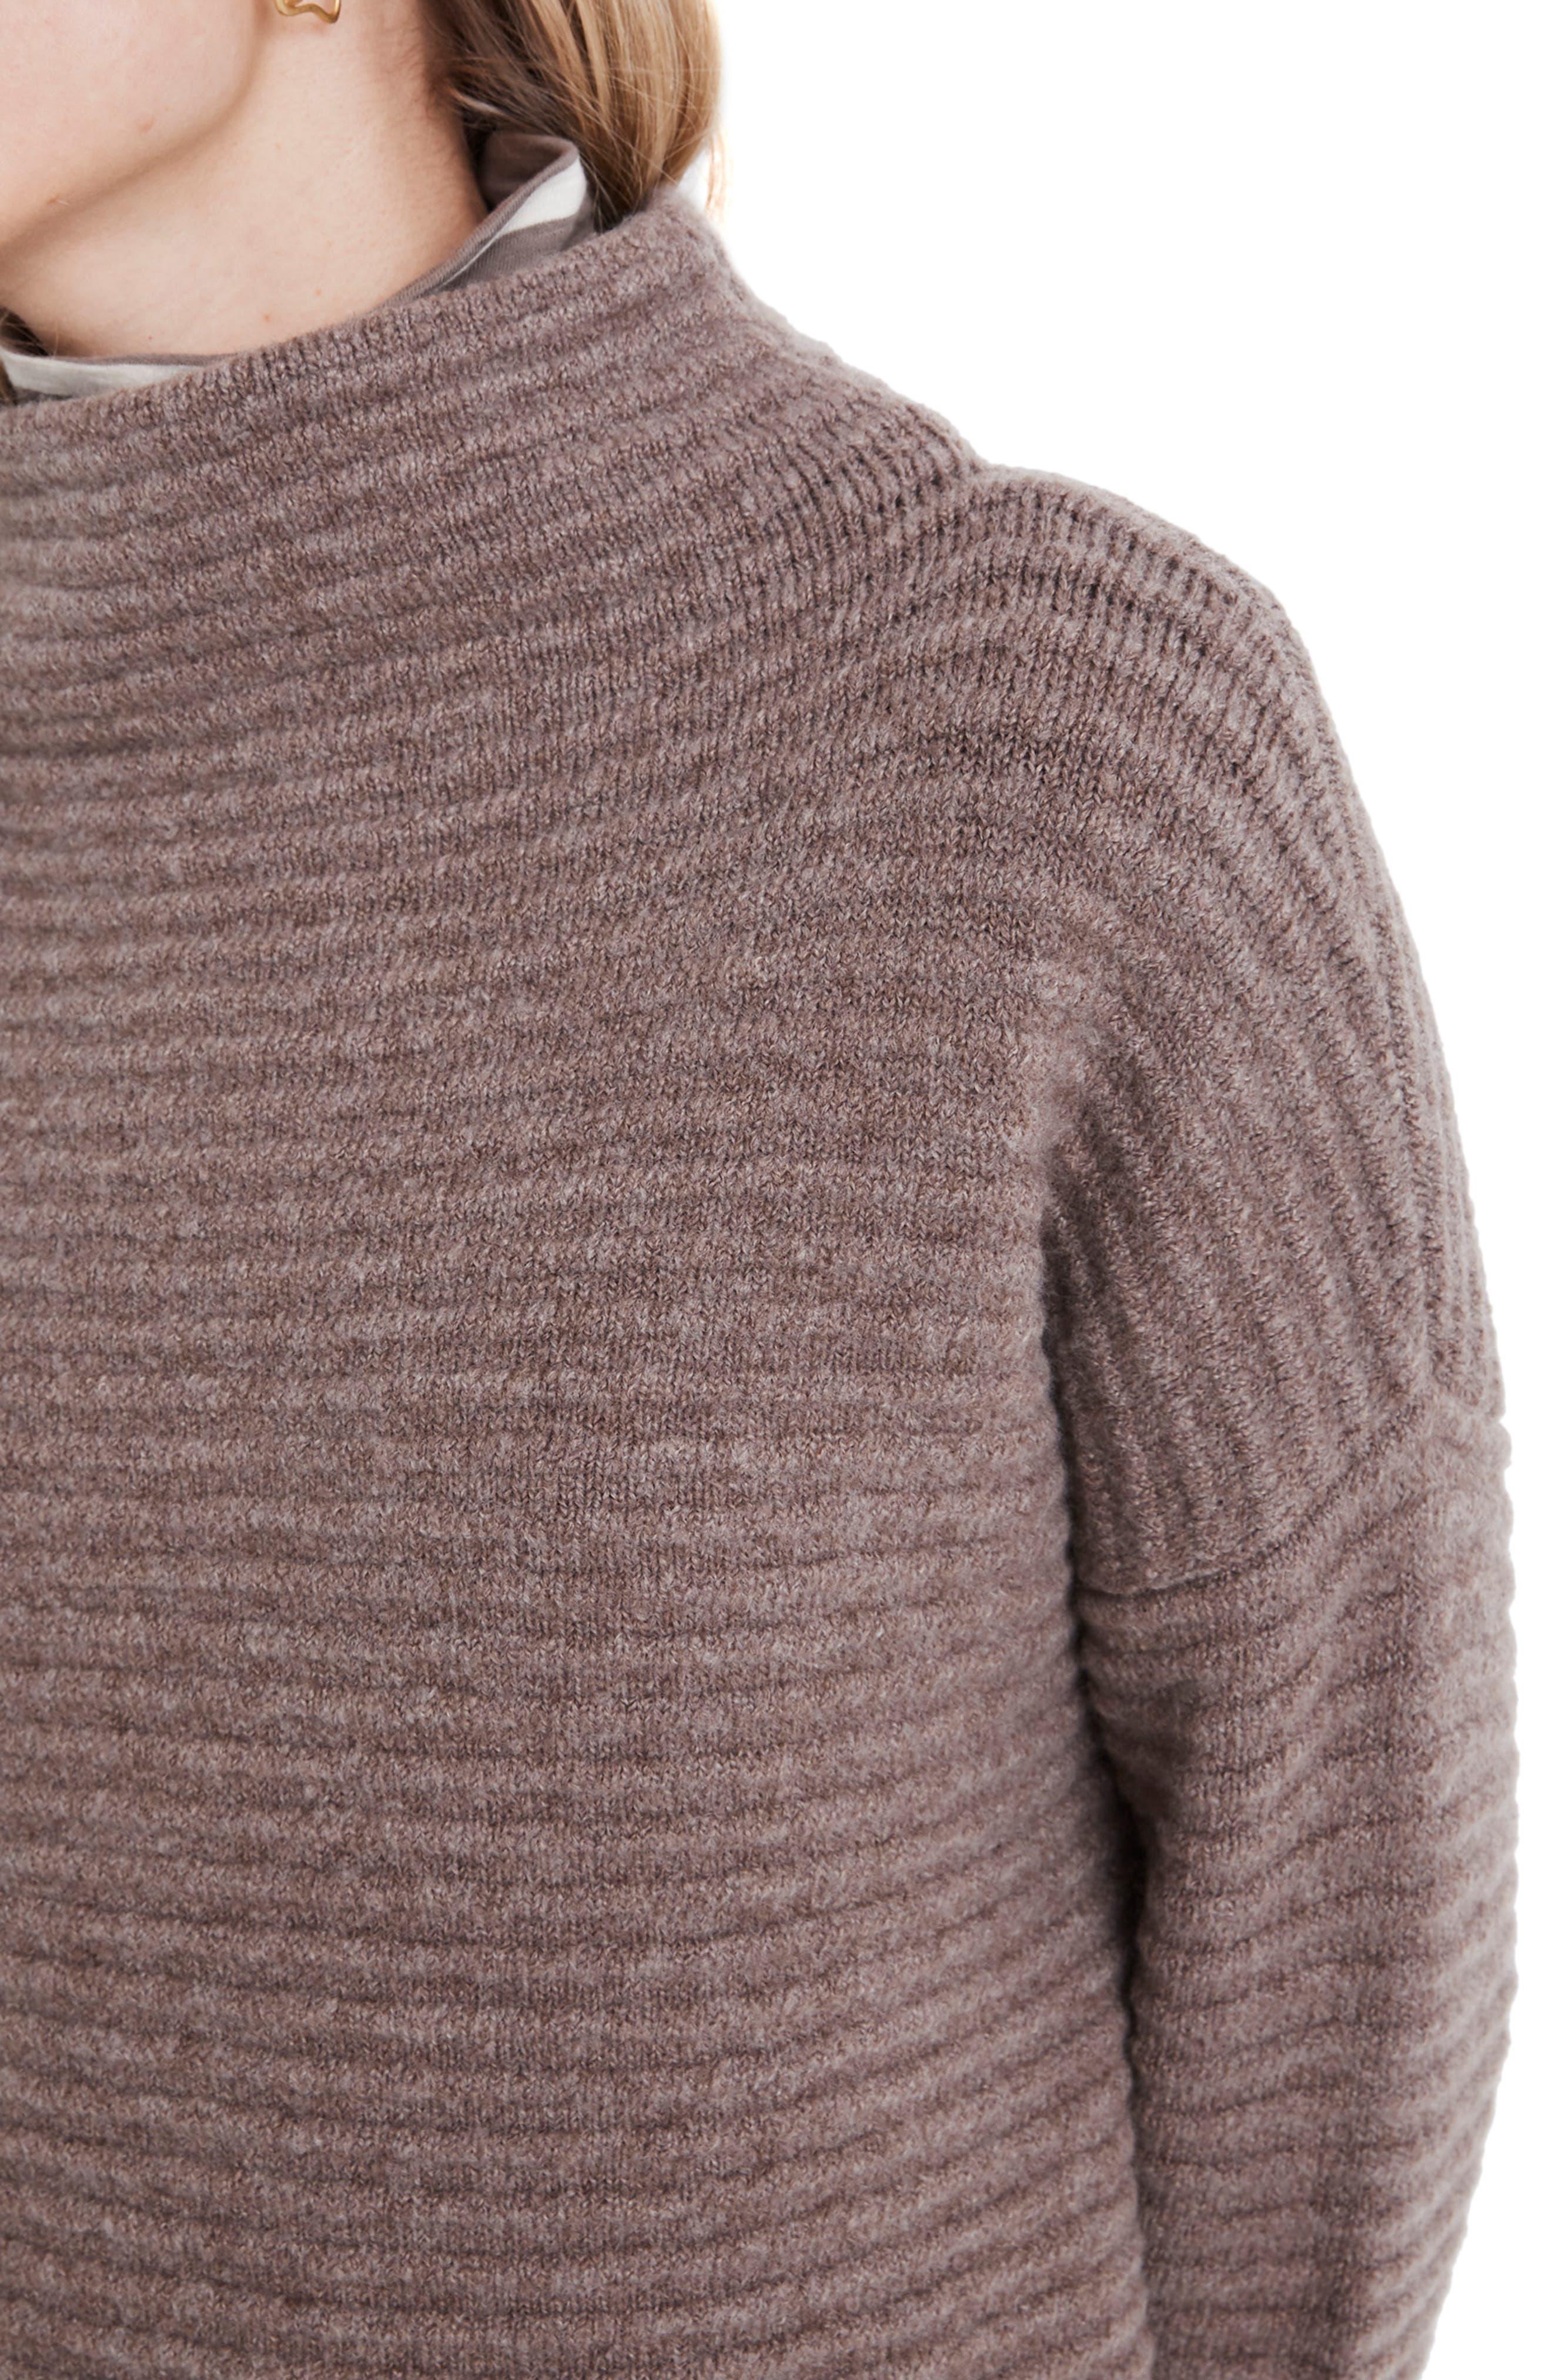 Belmont Mock Neck Sweater,                             Alternate thumbnail 4, color,                             HEATHER ROOT